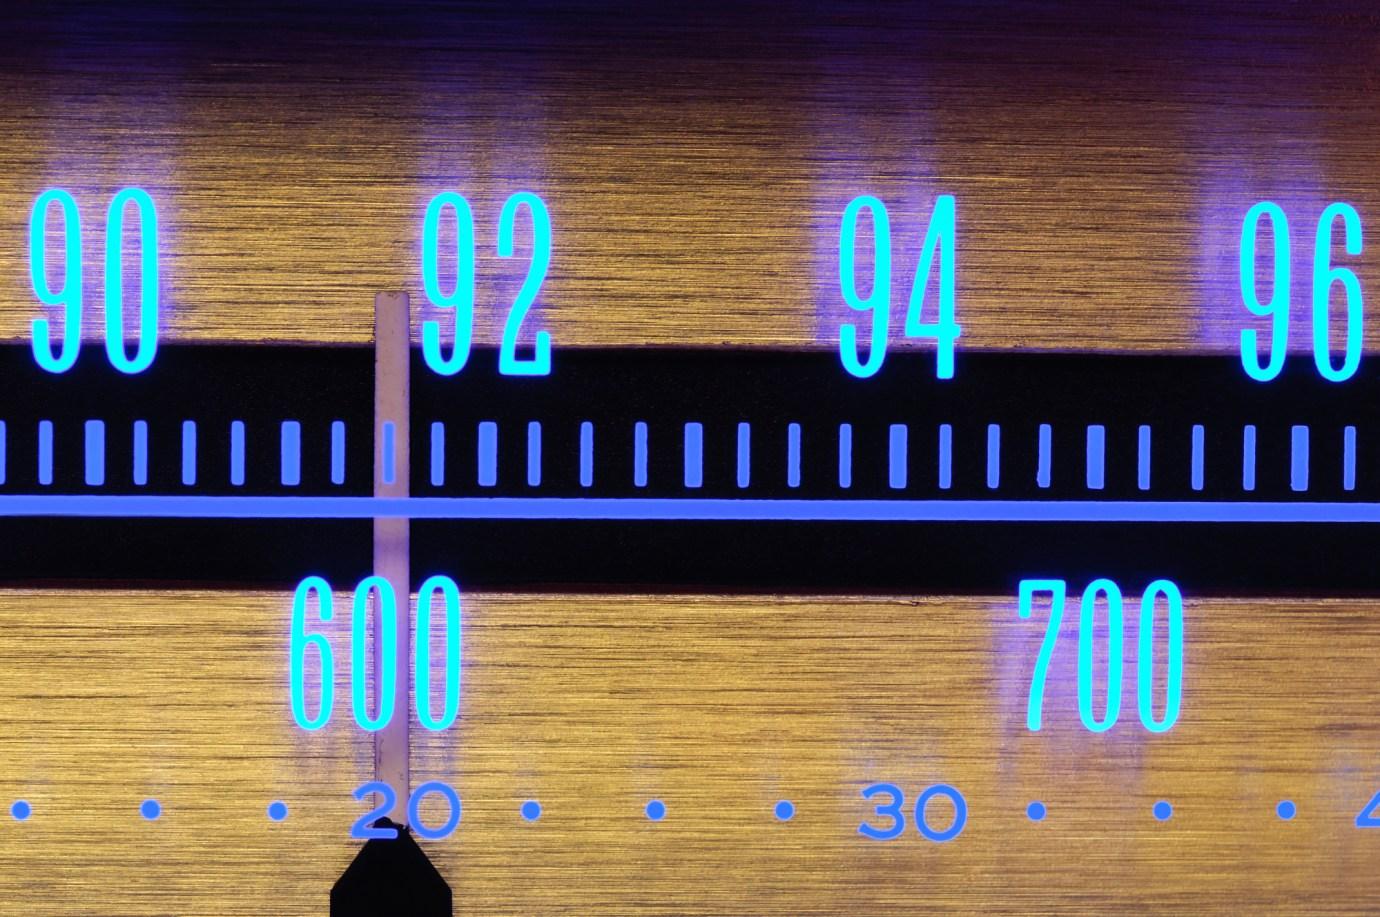 Glowing Radio Dial